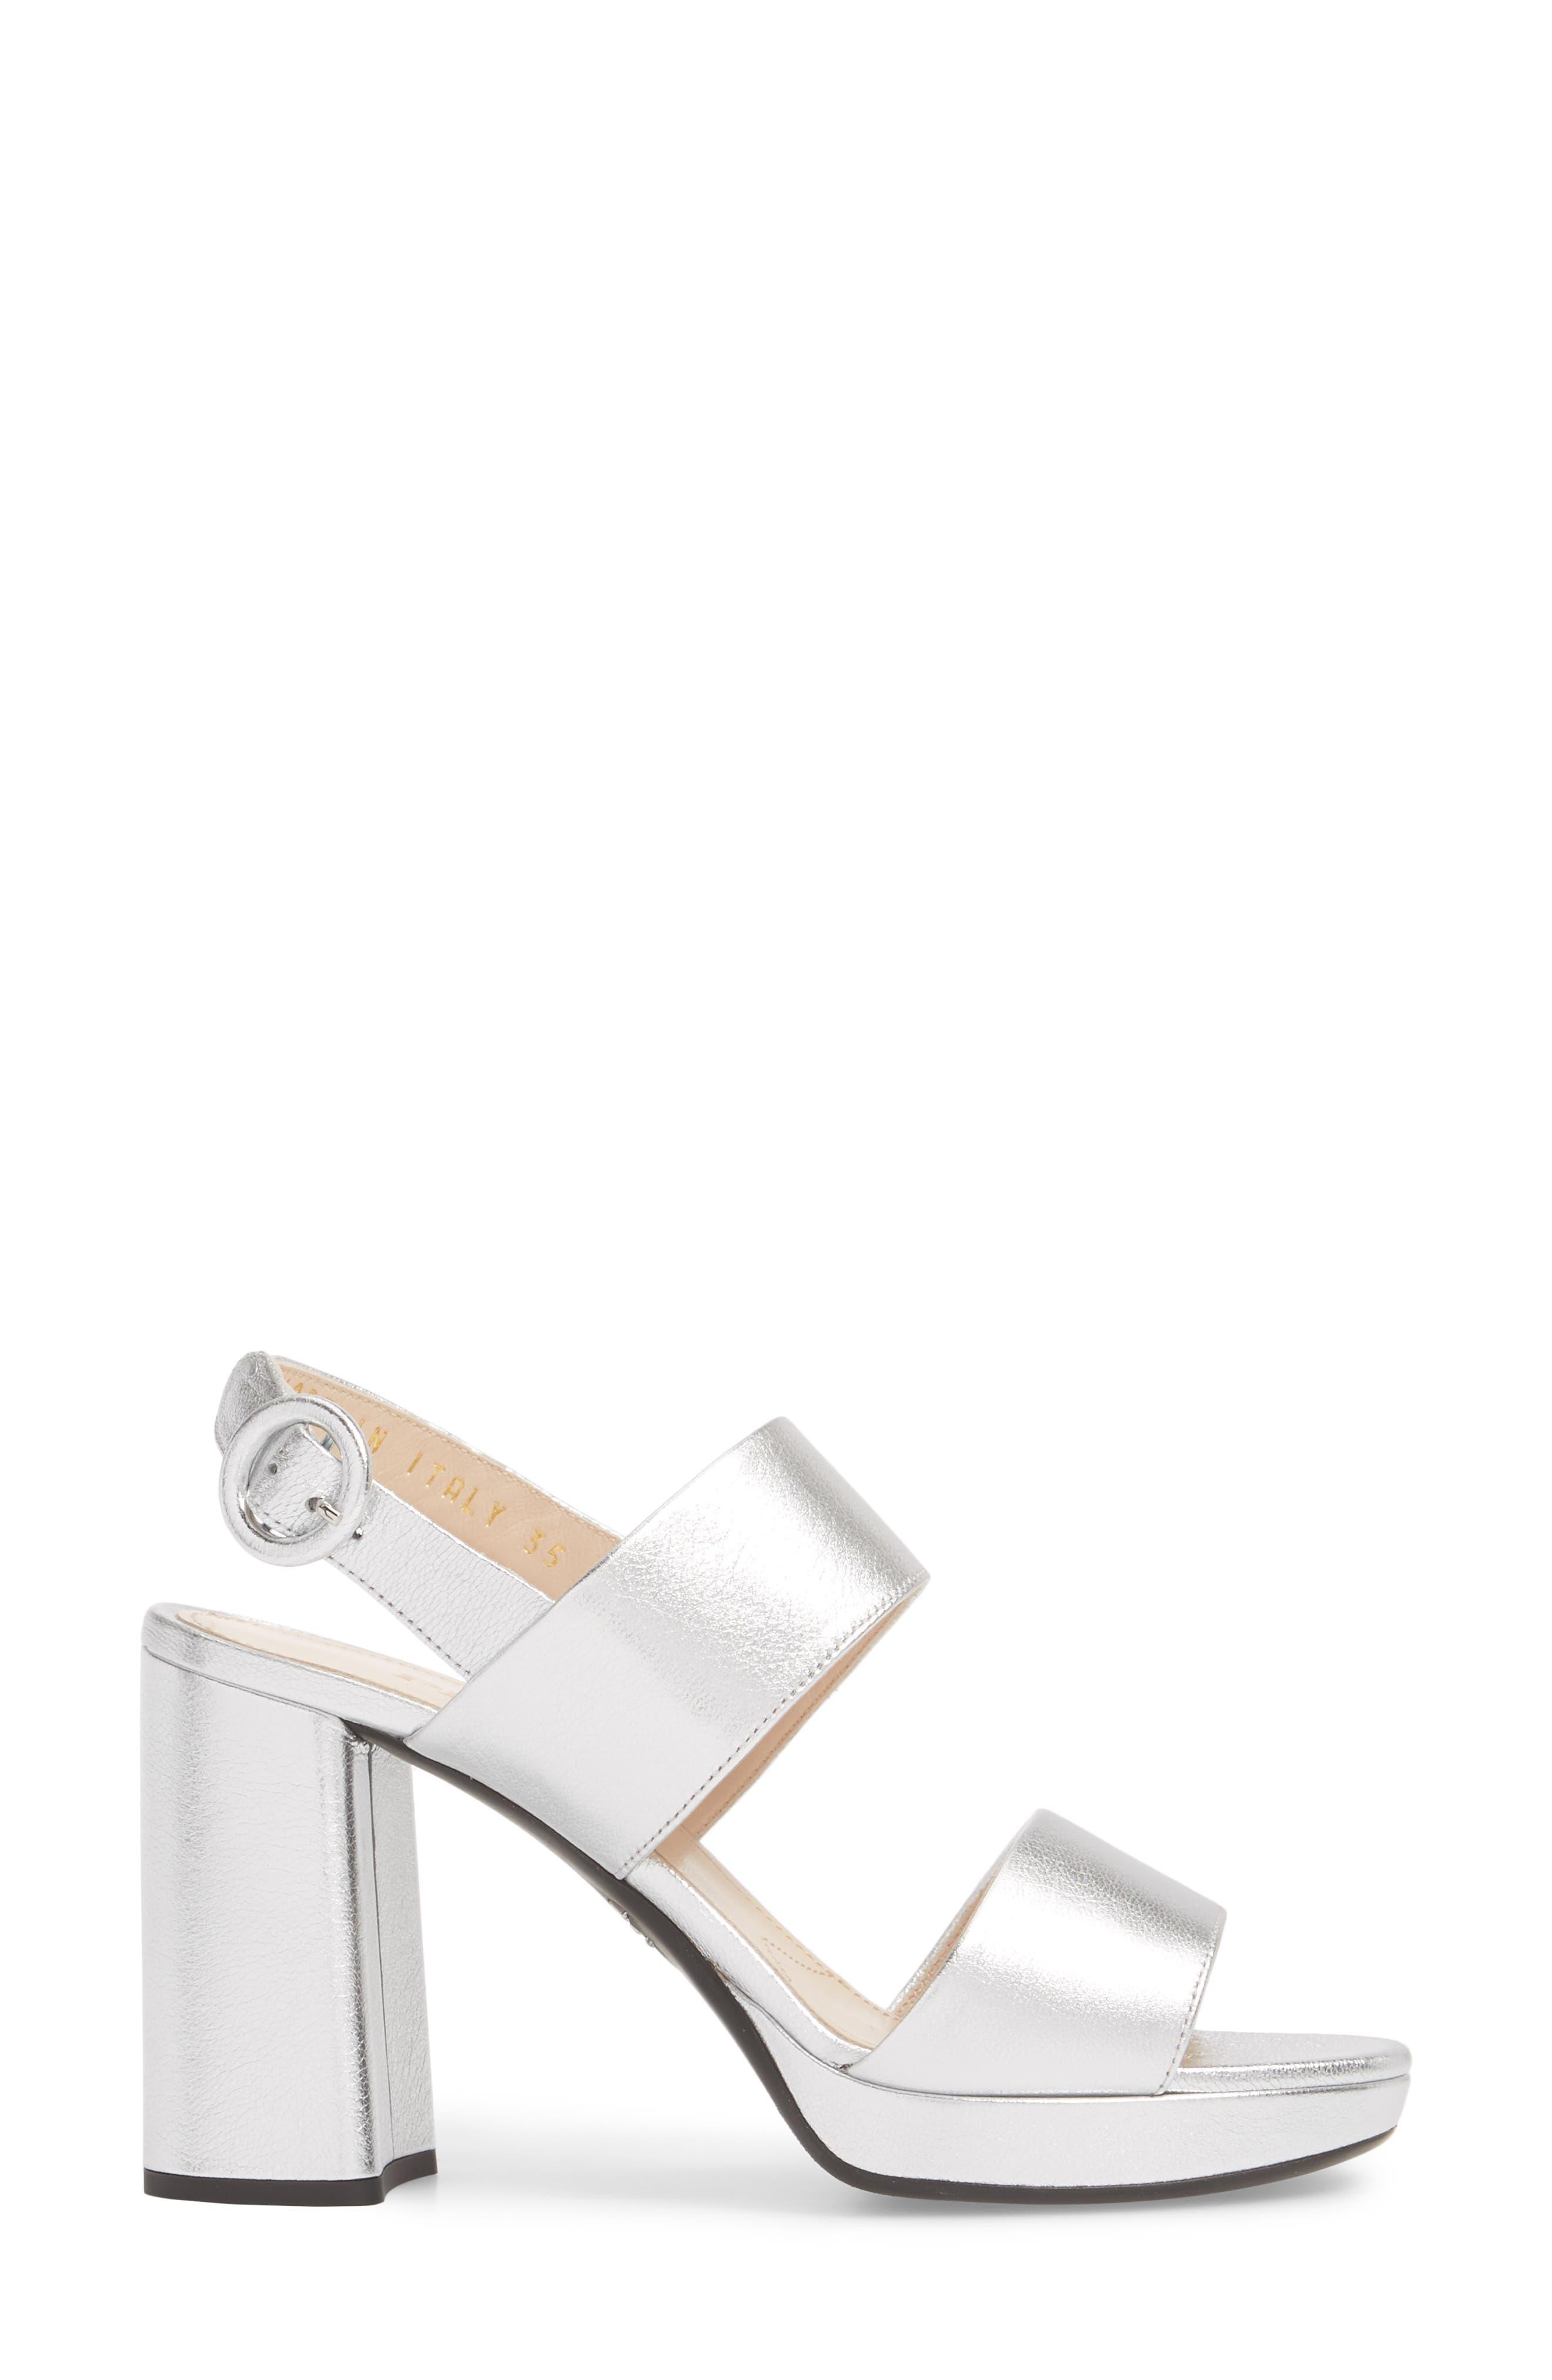 PRADA, Double Band Platform Sandal, Alternate thumbnail 3, color, SILVER